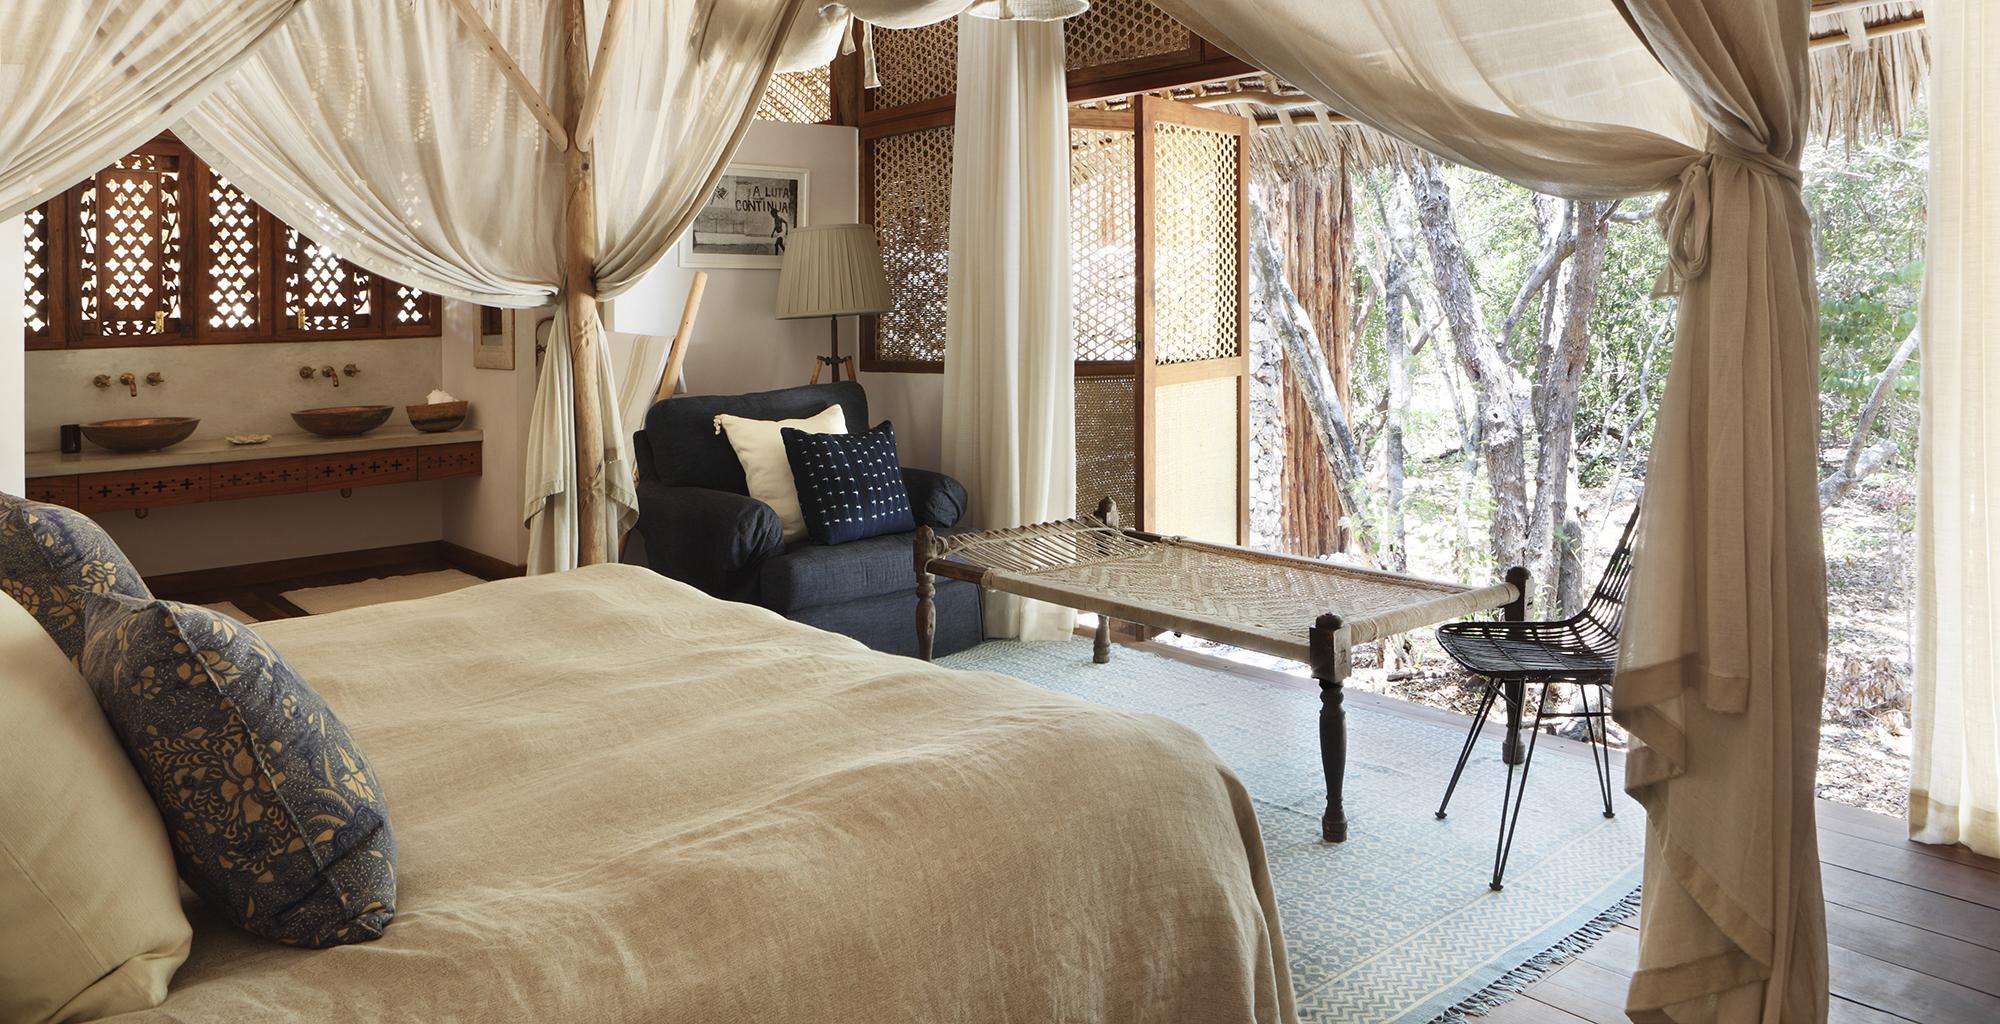 Mozambique-Quirimbas-Vamizi-Lodge-Bedroom